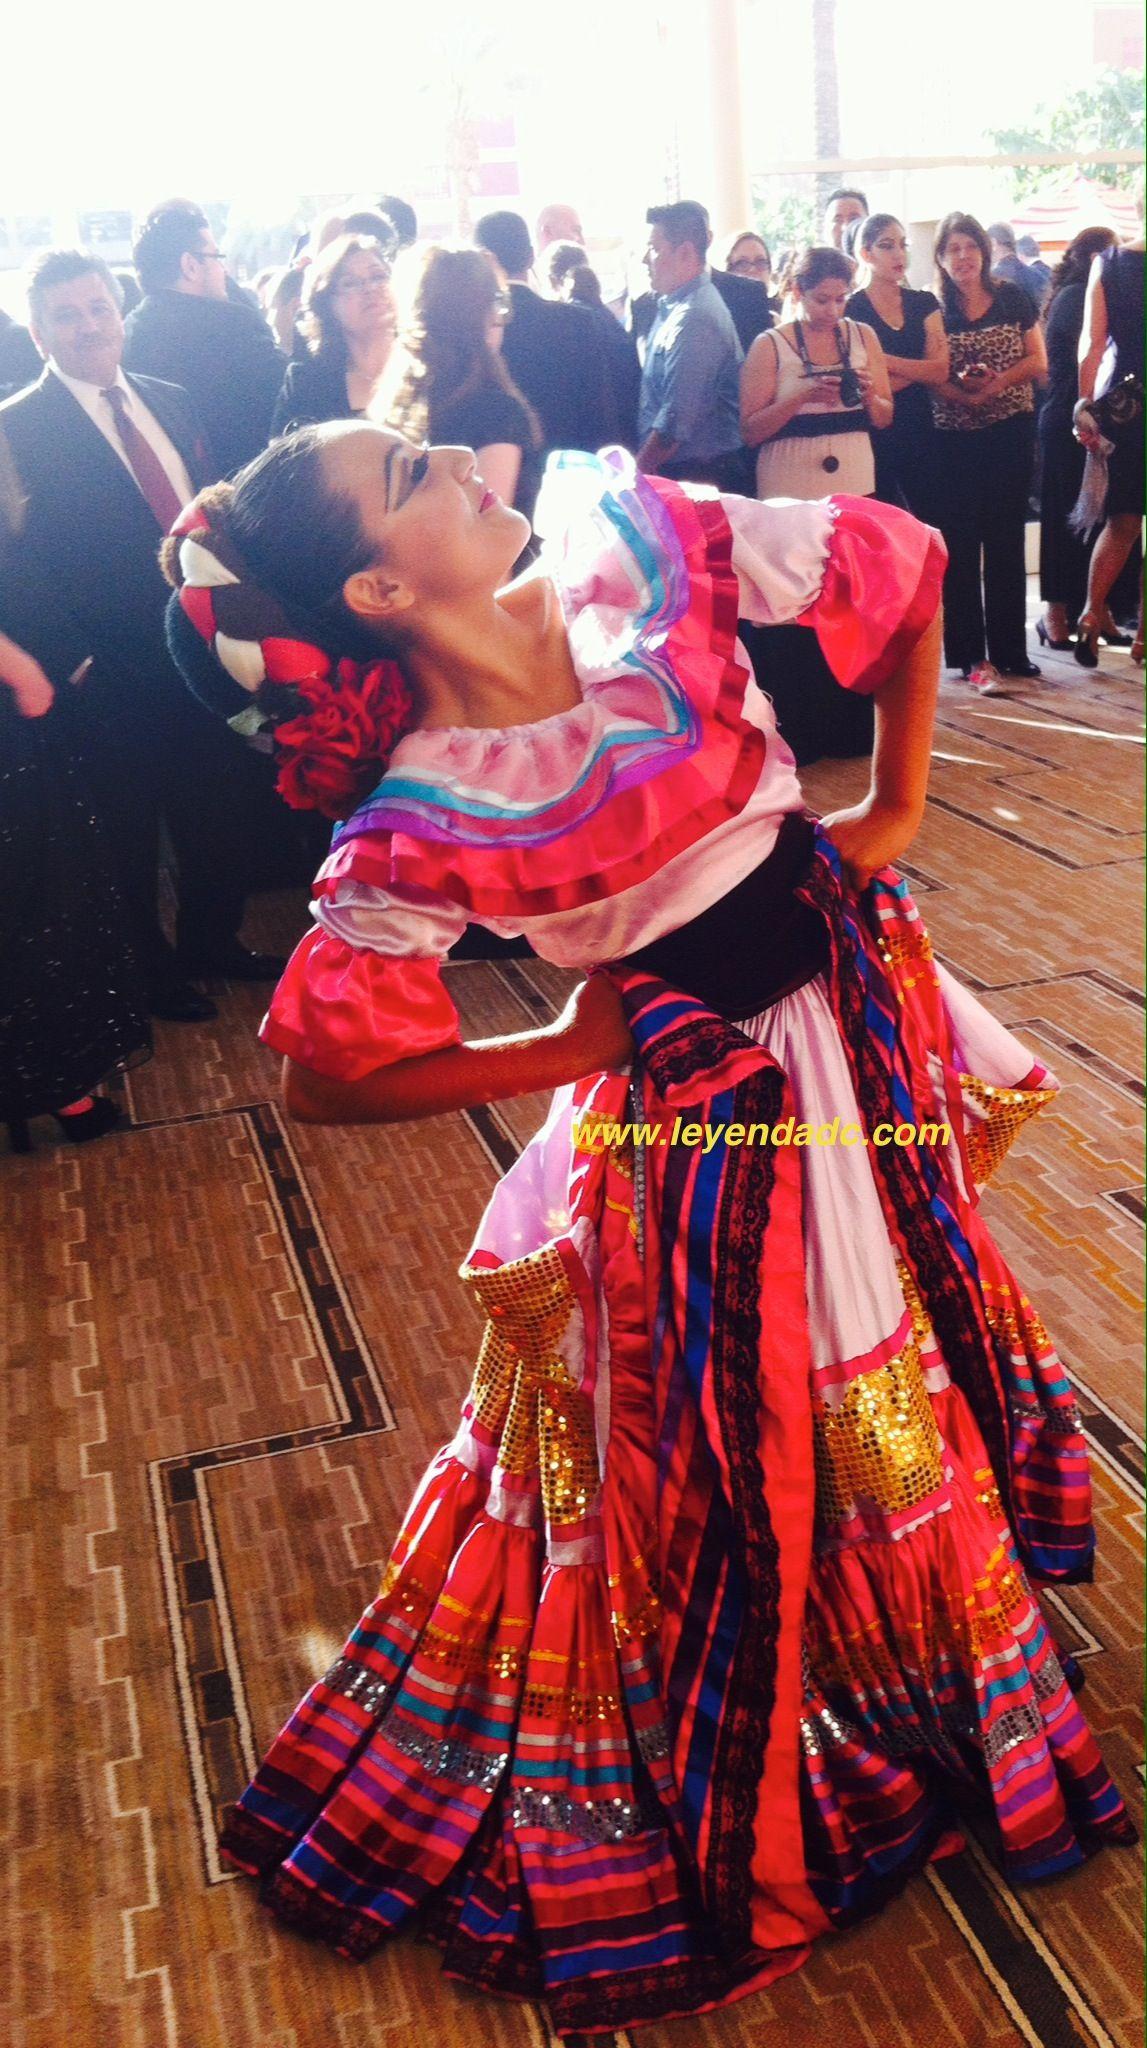 Request Info From Our Ballet Folklorico Ballet Folklorico Http Www Leyendadc Com Default Asp F Guestbook D Ballet Folklorico Ballet Professional Dancers